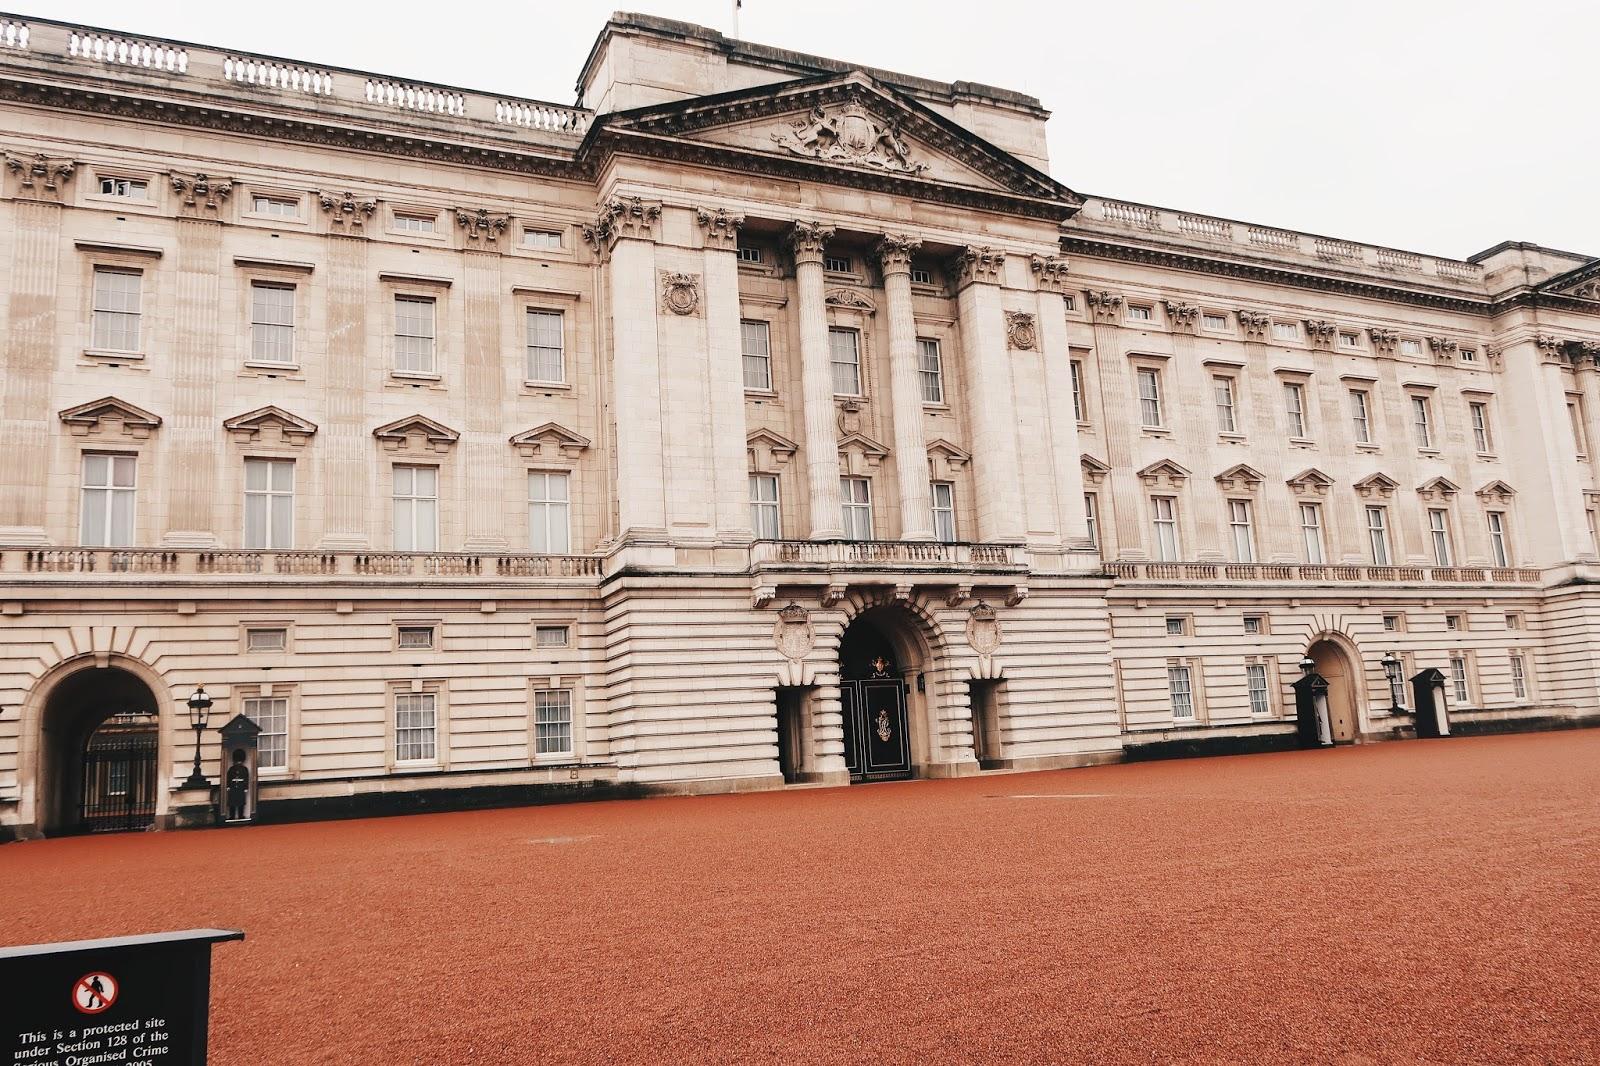 palacio-de-buckingham-londres